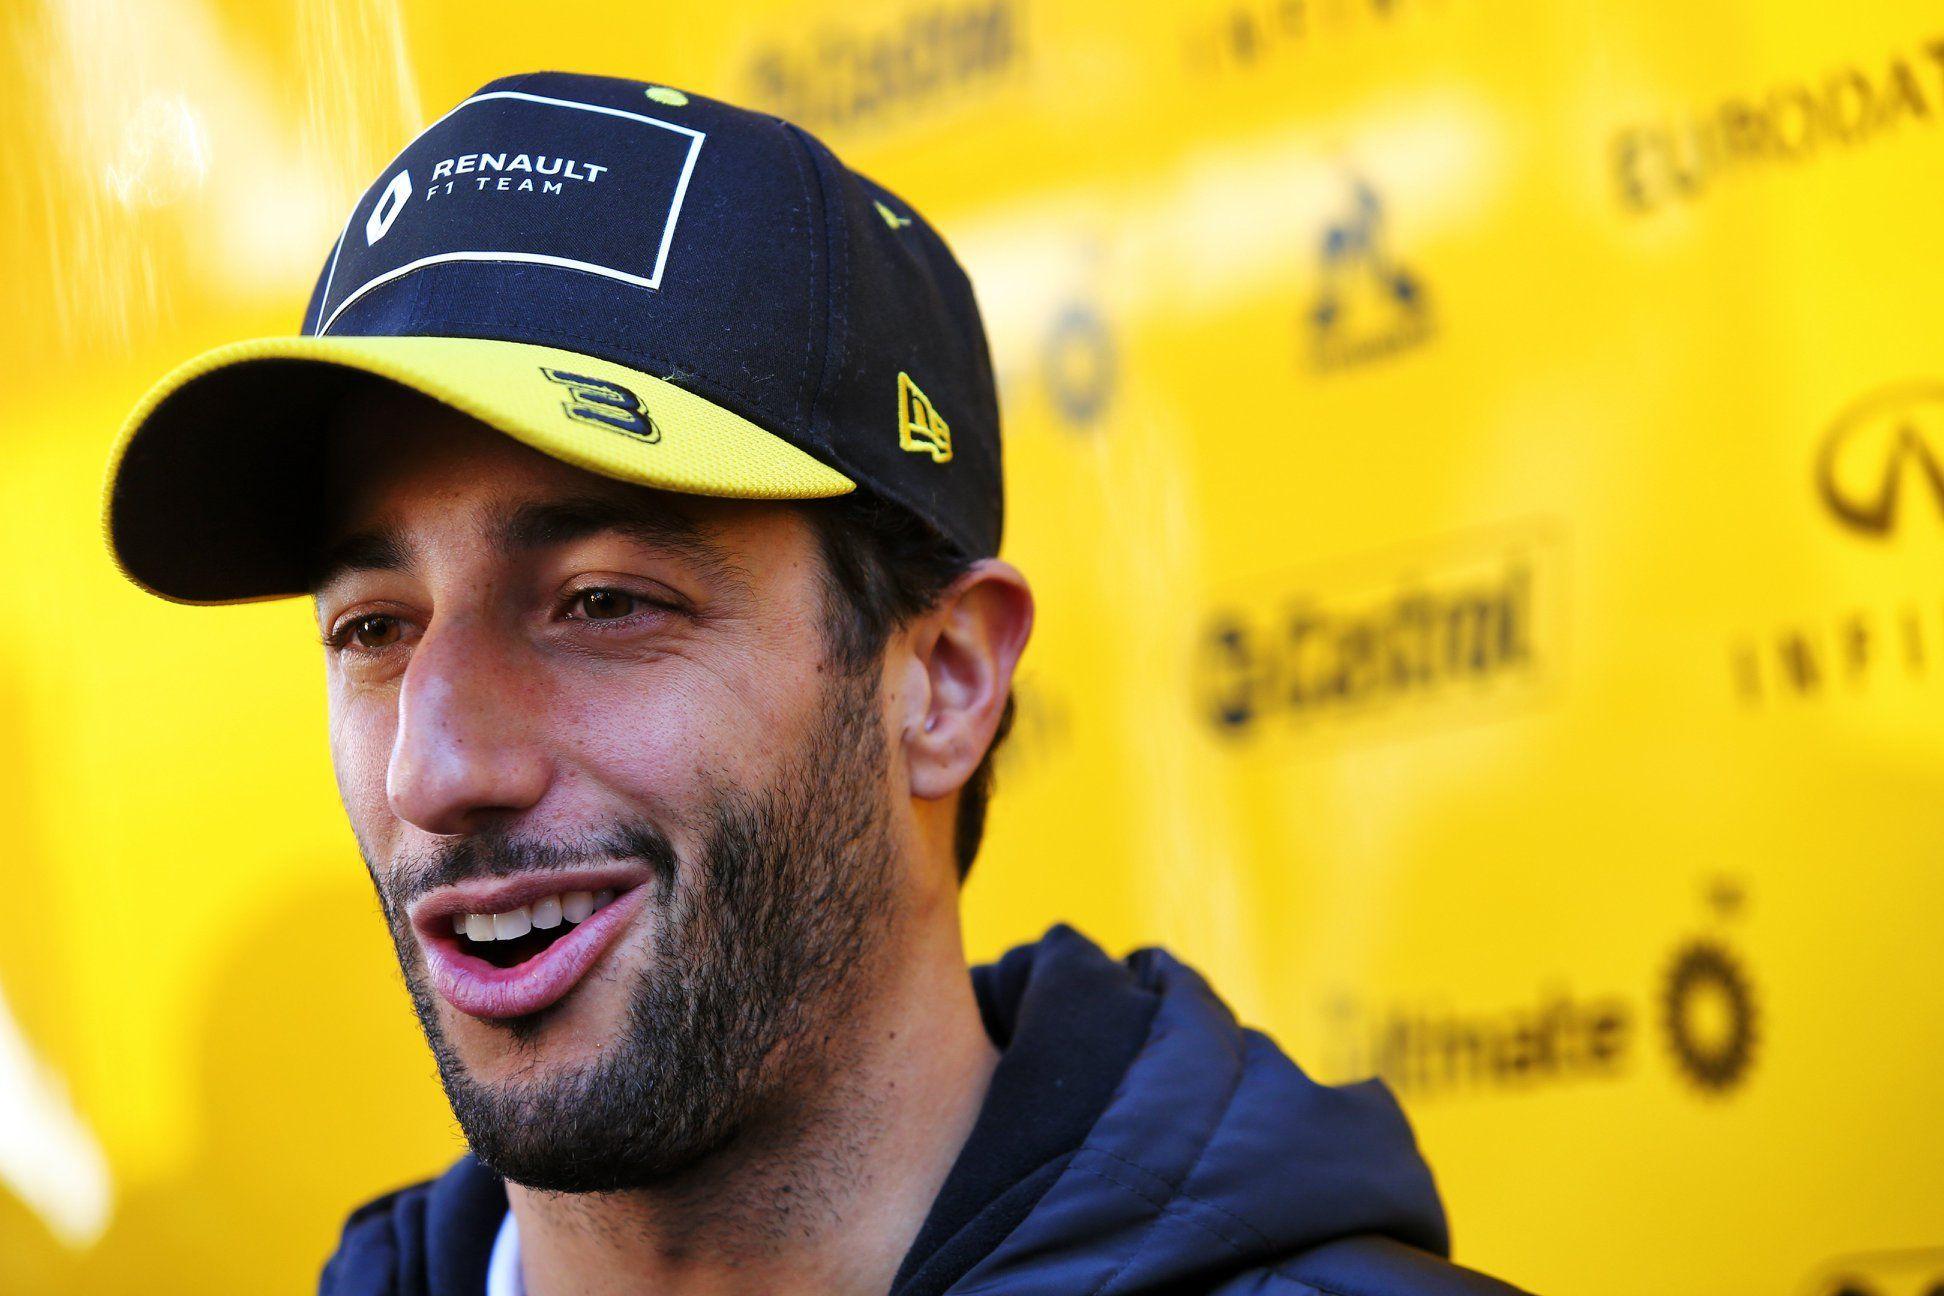 F1, Daniel Ricciardo, F1 Nation